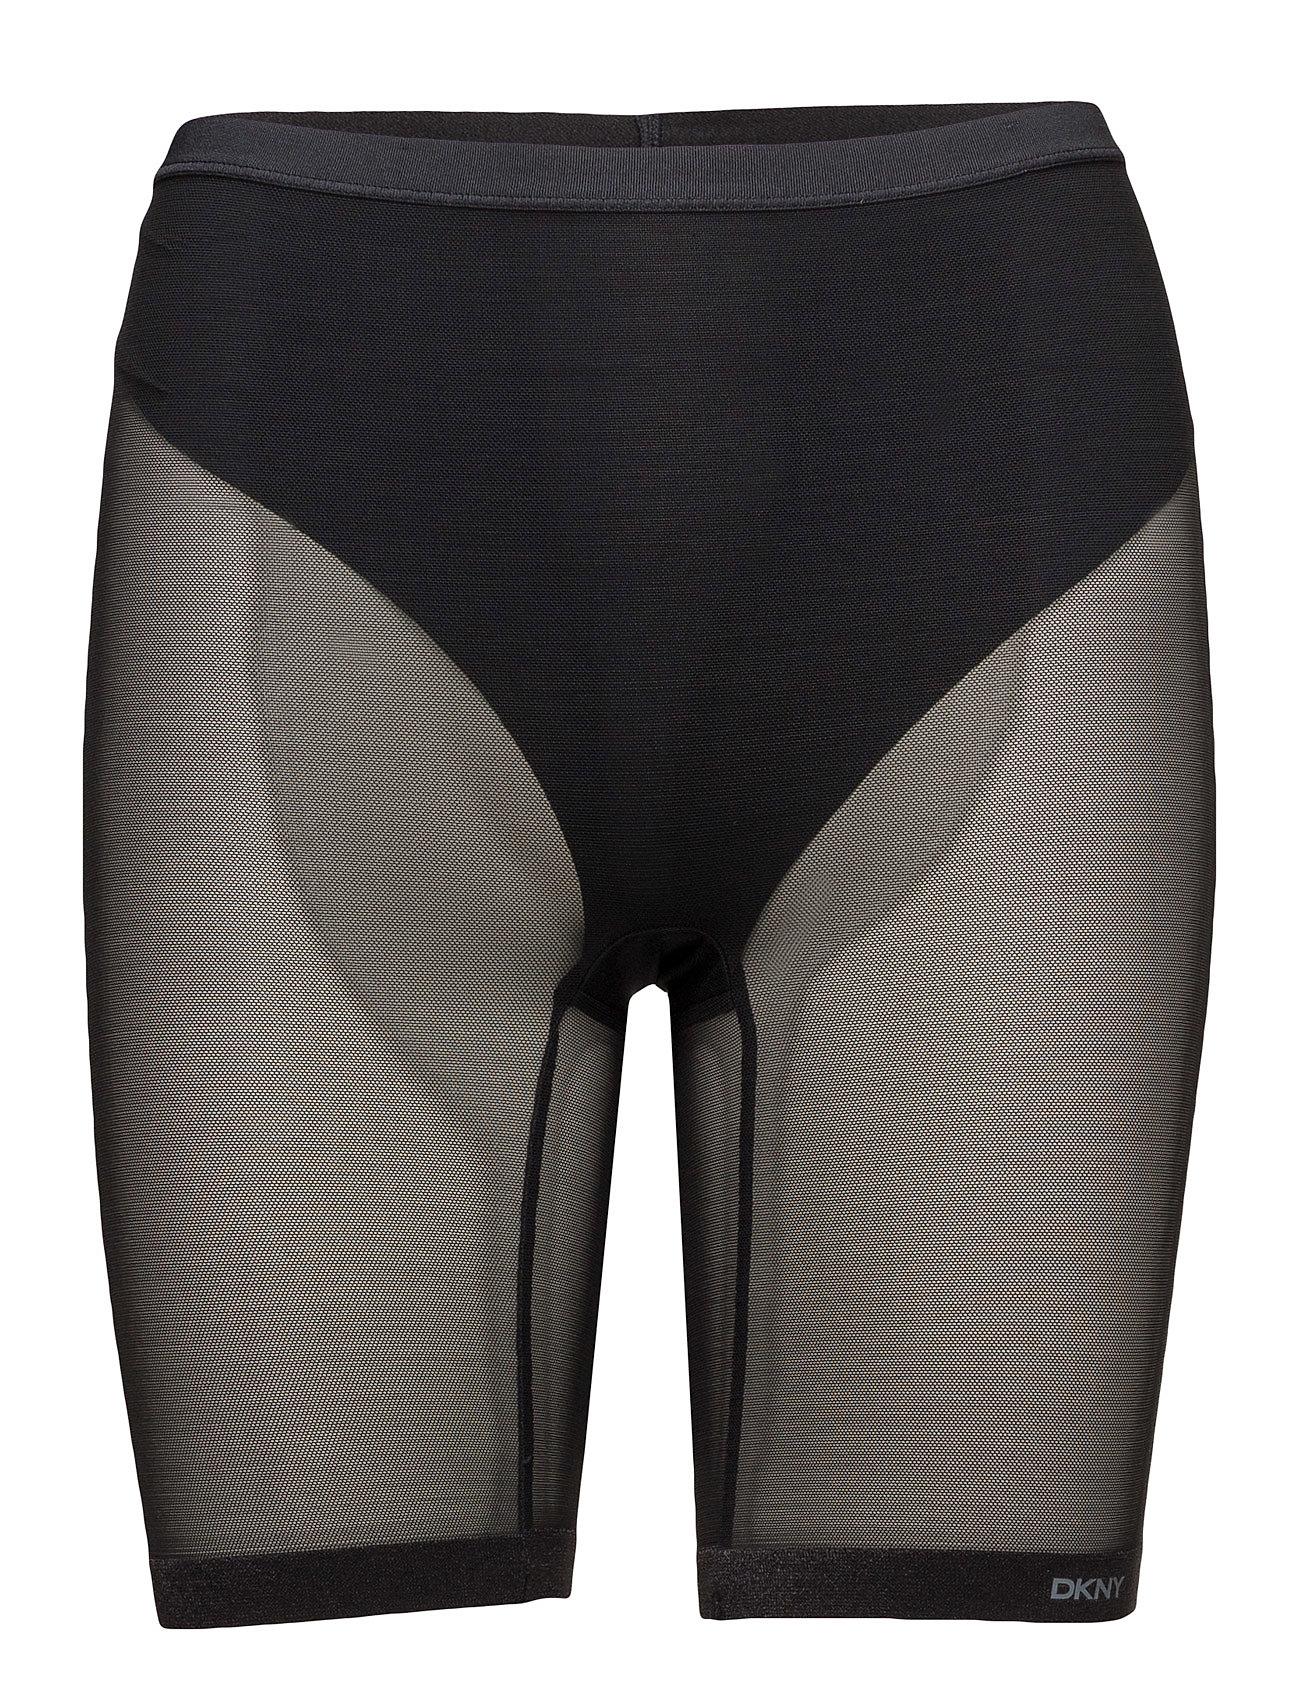 Modern Lights-Mesh Litewe DKNY Shapewear til Damer i Sort